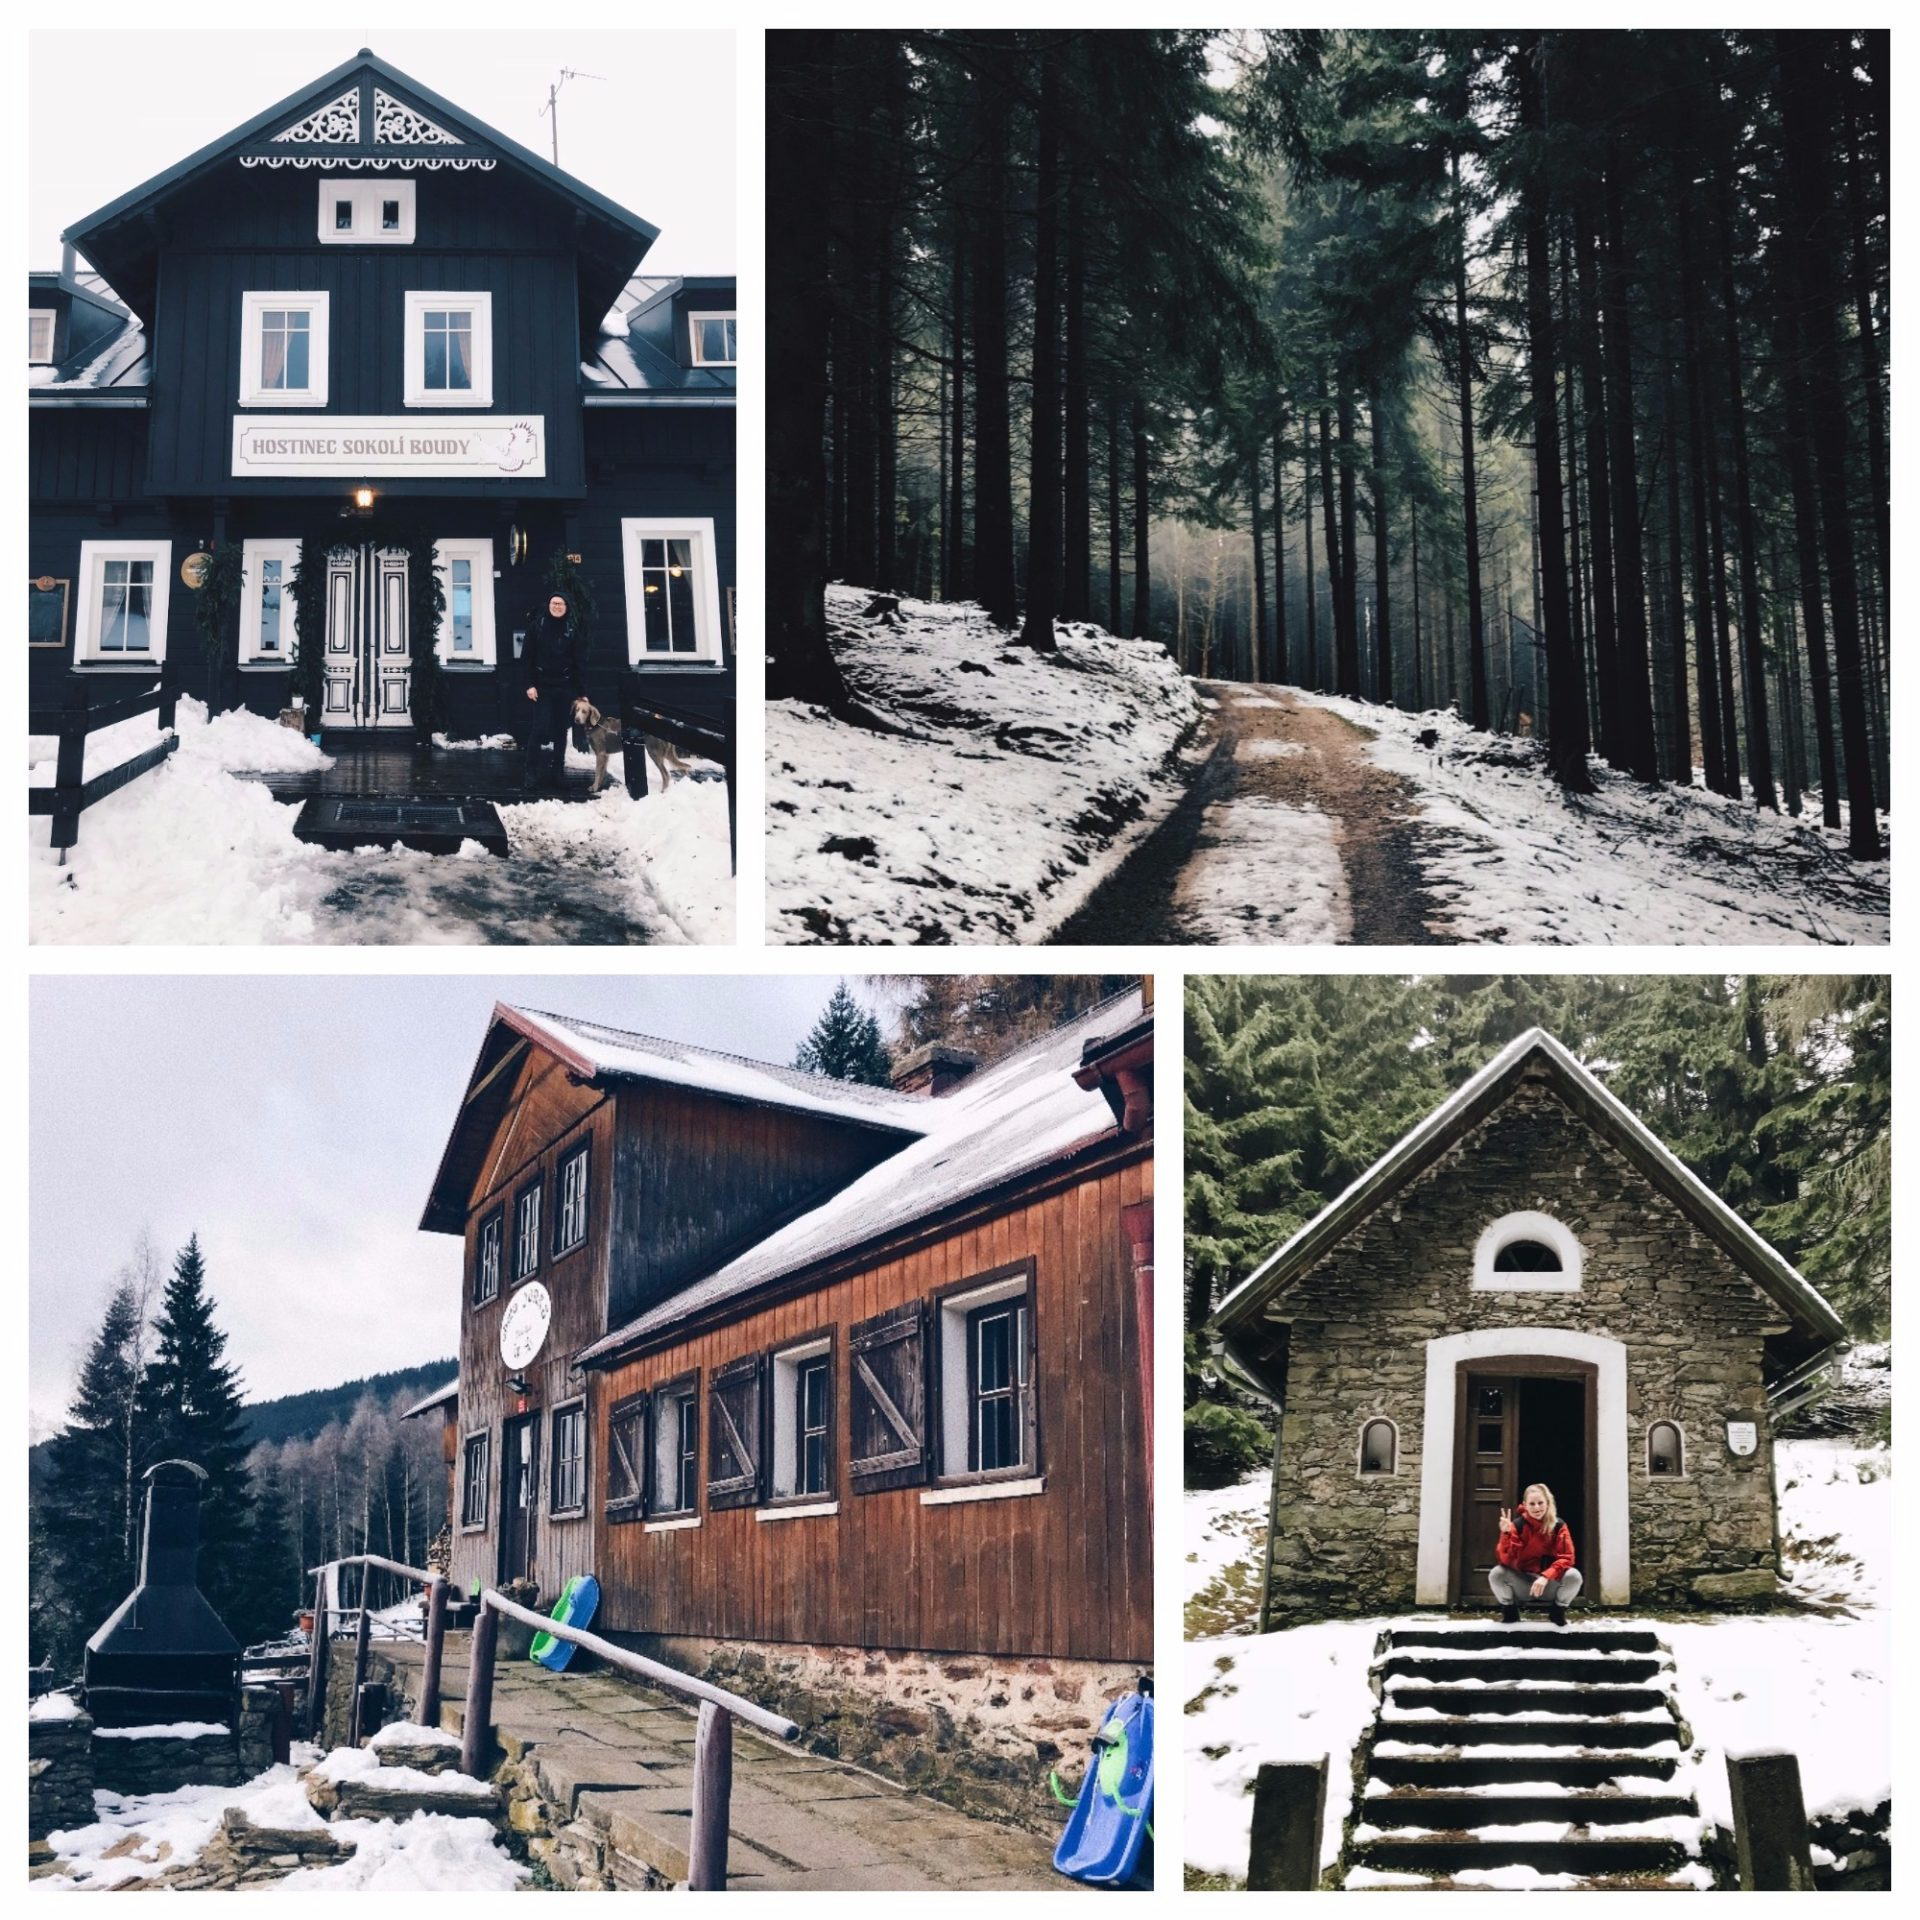 krkonoše, les, turistika, výlet, chata